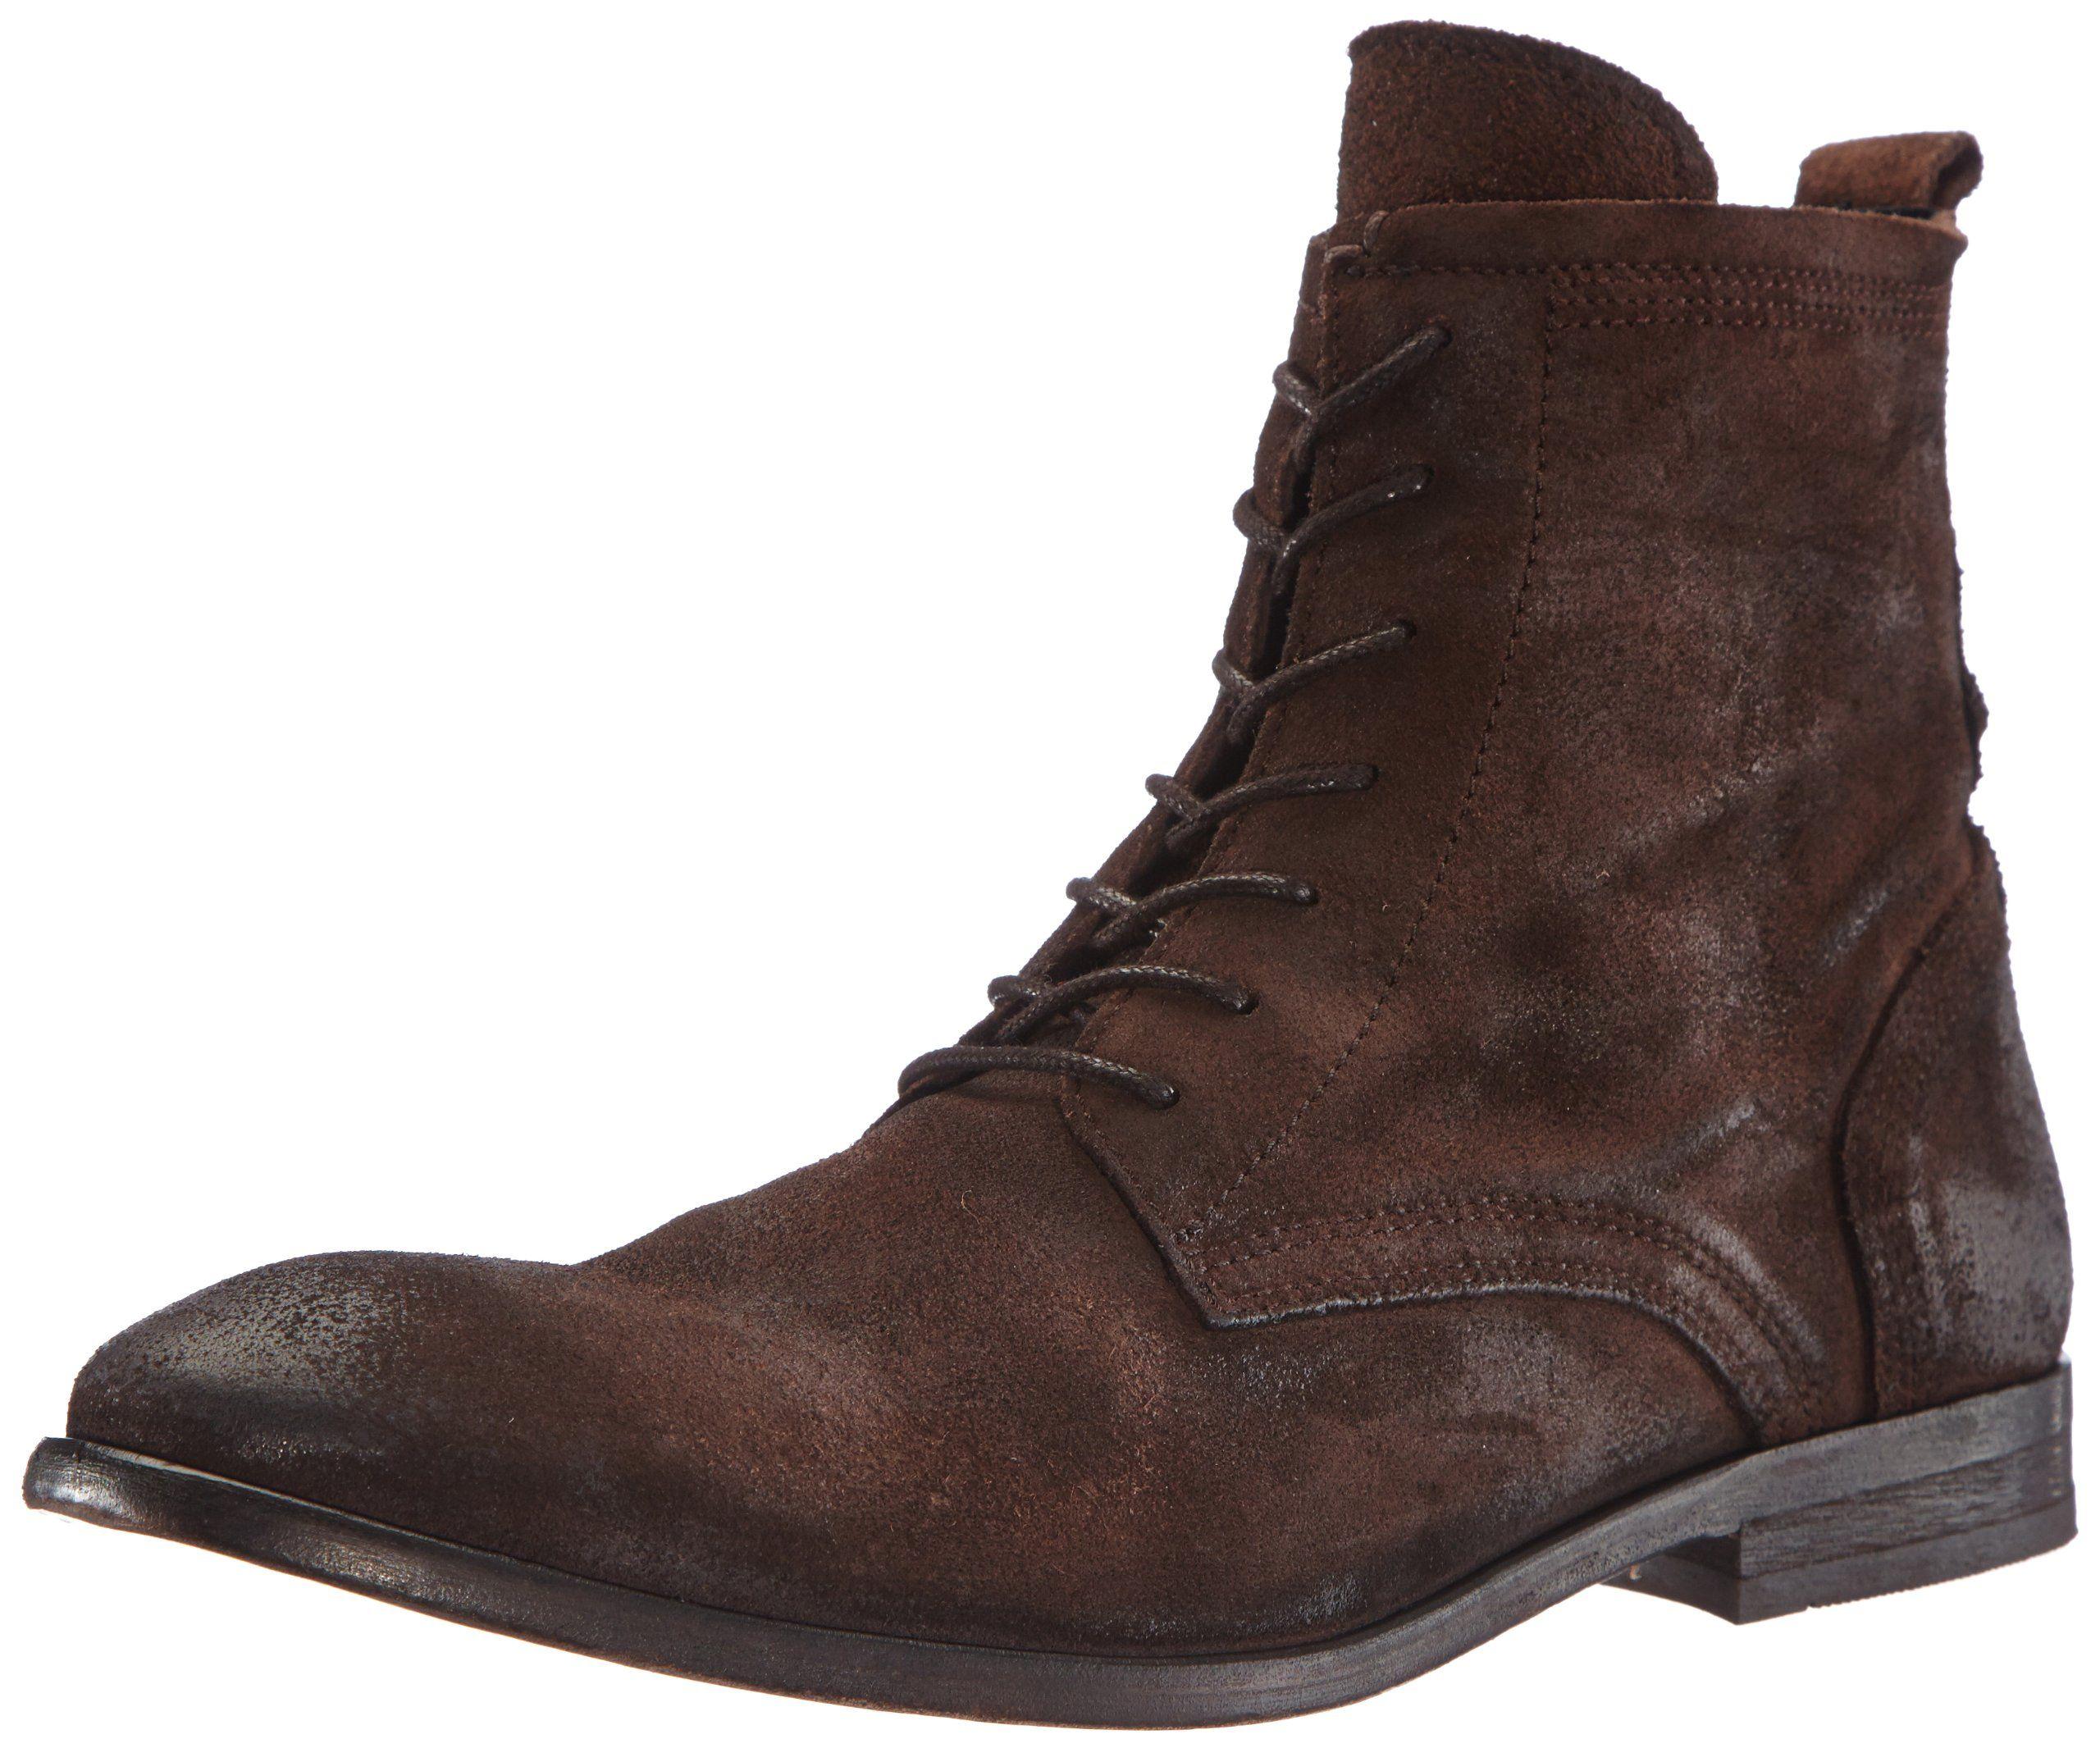 Hudson Swathmore, Boots homme: Amazon.fr: Chaussures et Sacs